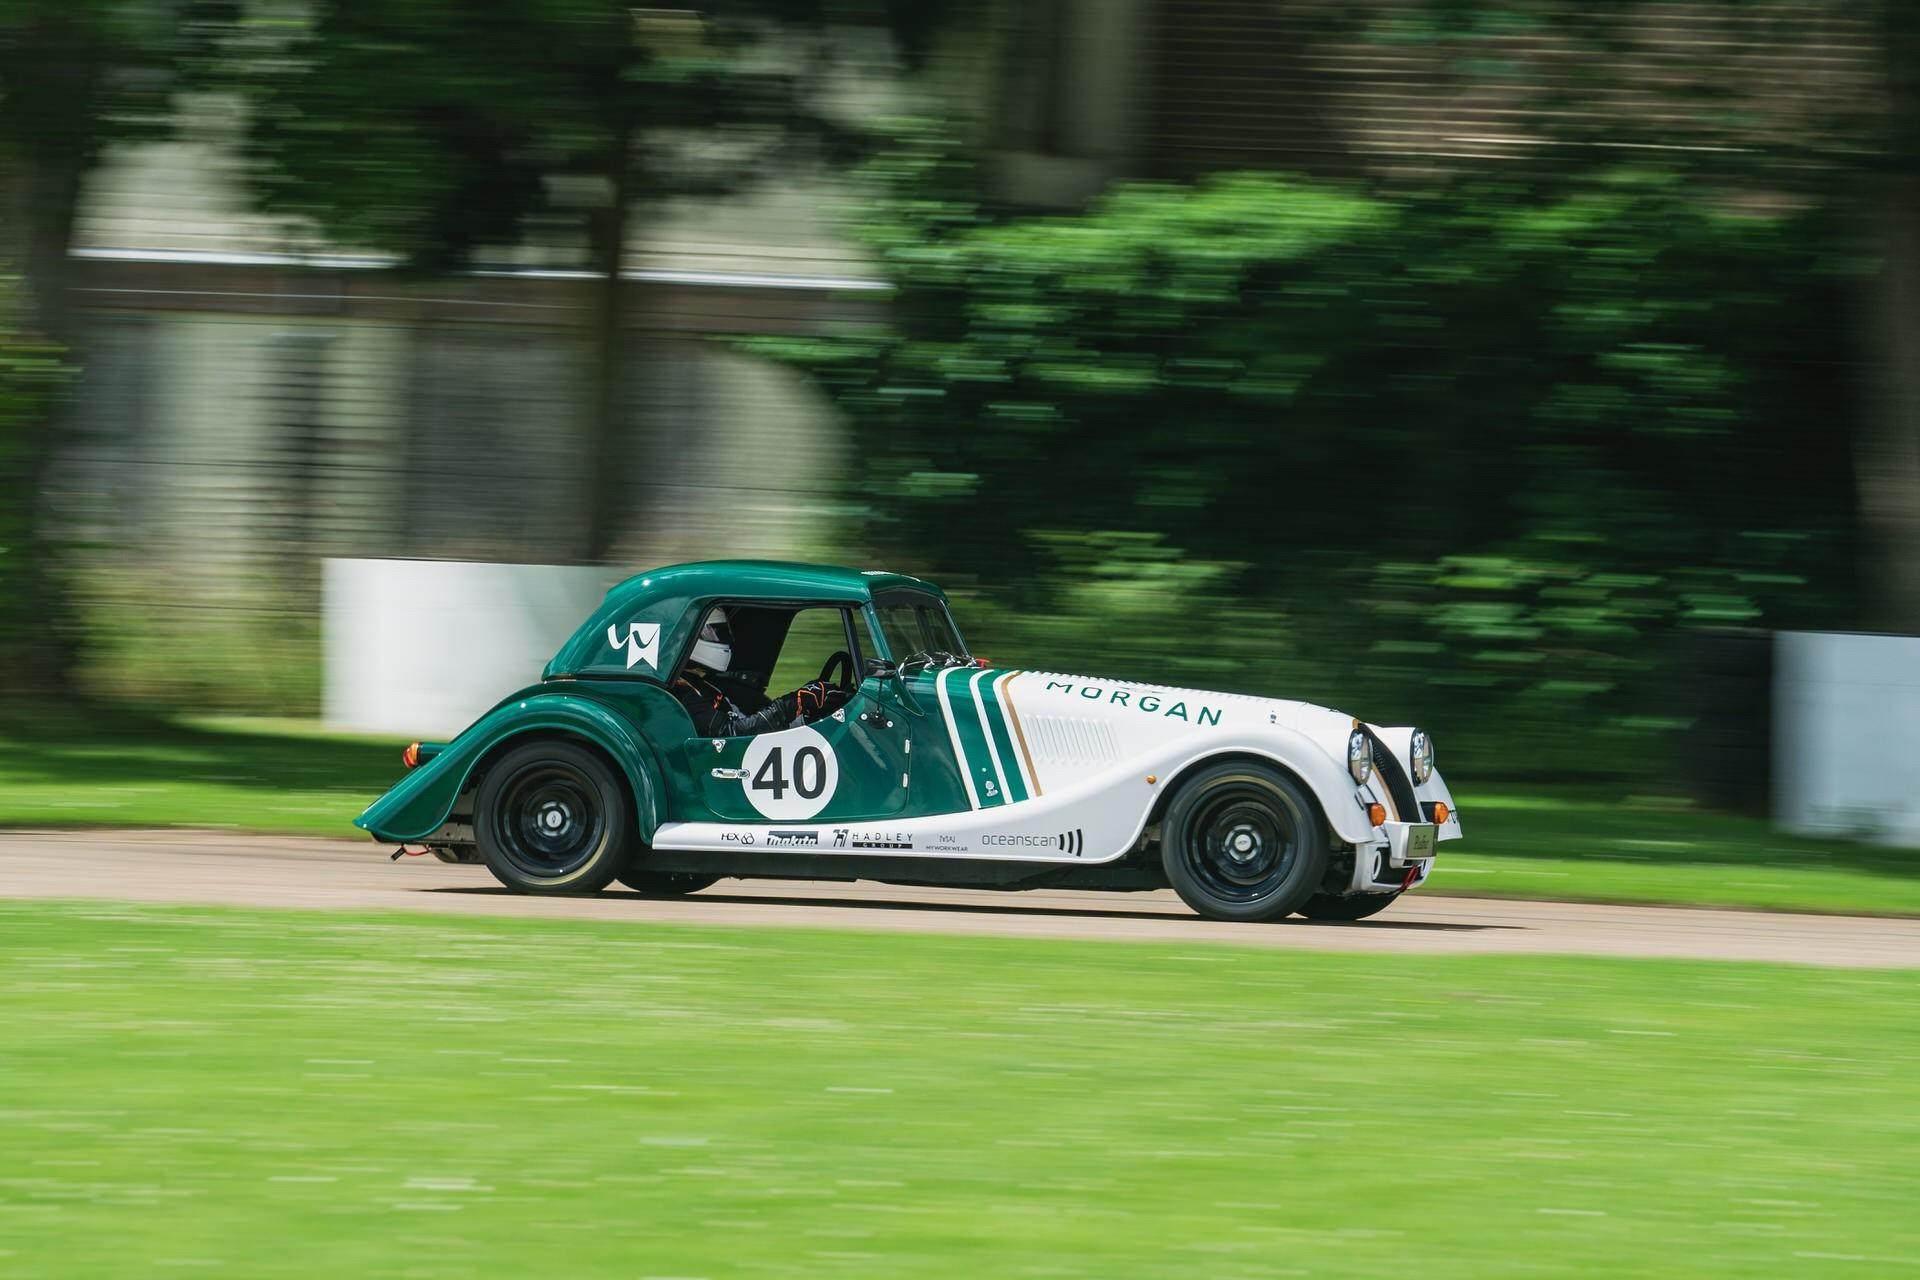 Morgan_Plus_Four_race_cars-0013